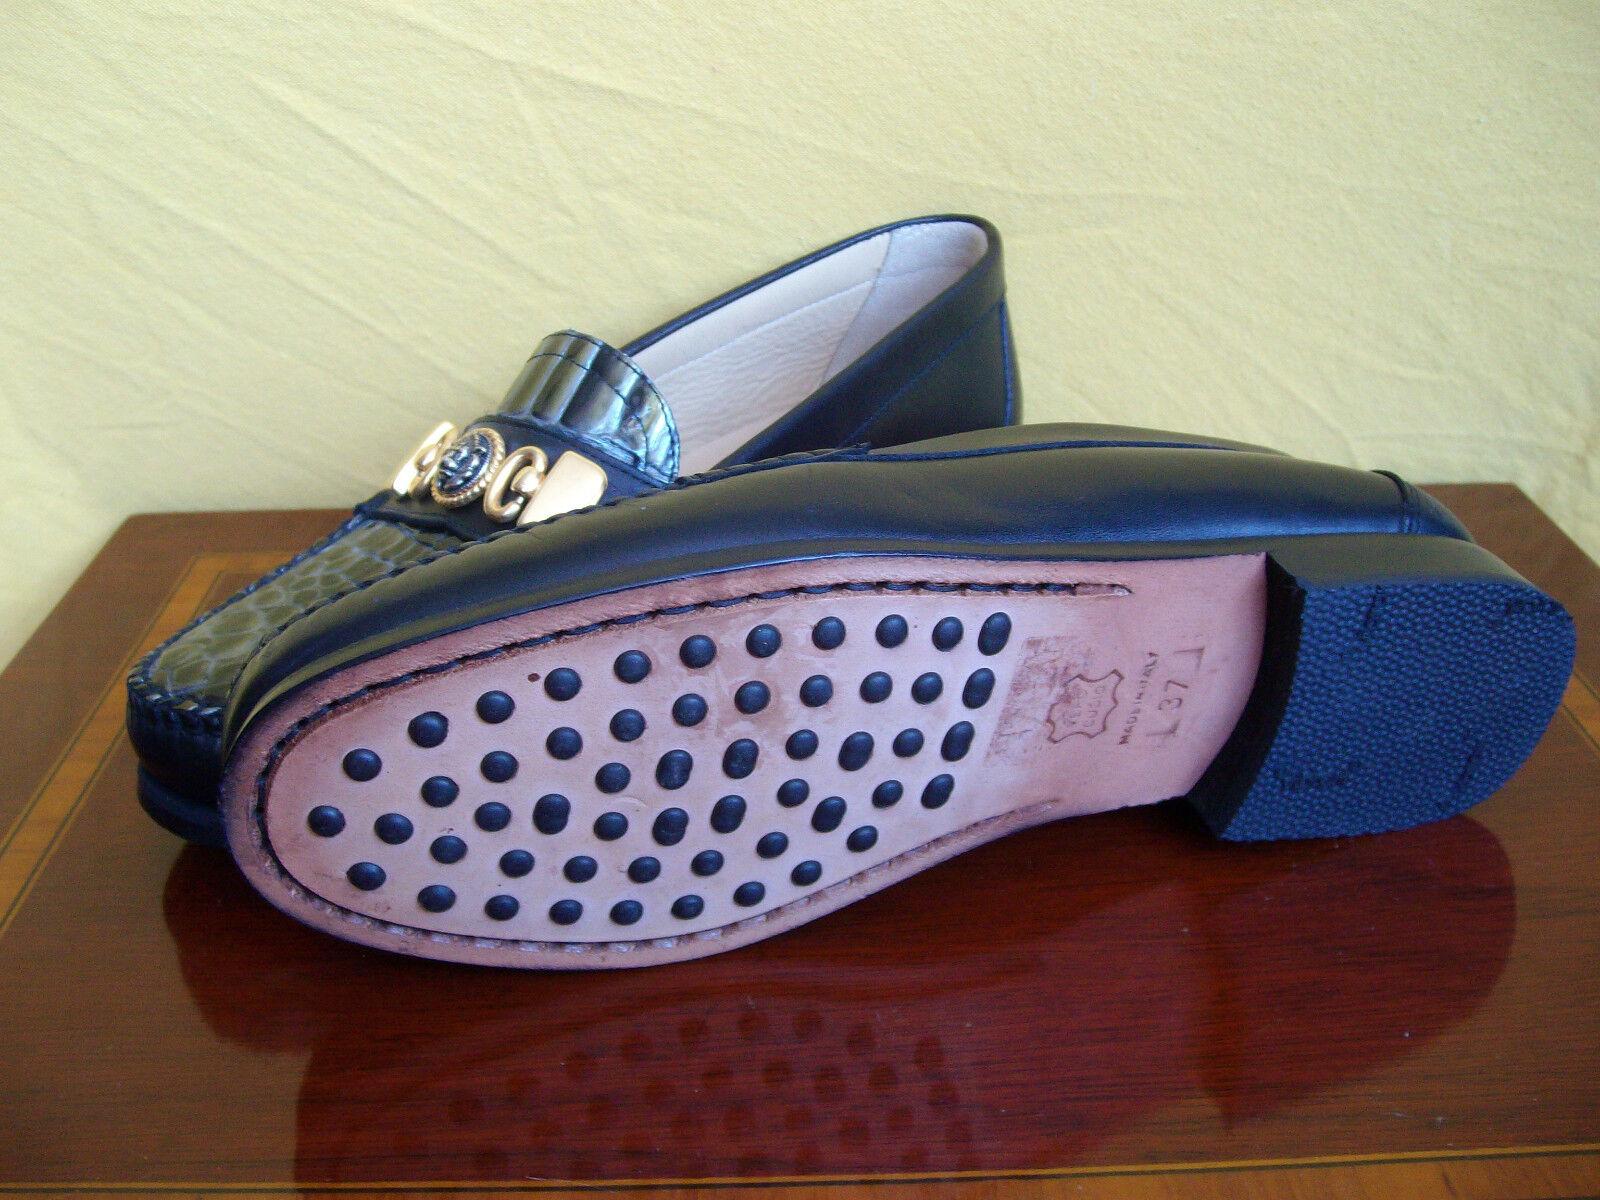 Damenschuhe - Halbschuhe 37 - Sauro - Größe 37 Halbschuhe - Leder schwarz mit Krokodiloptik f10a6c